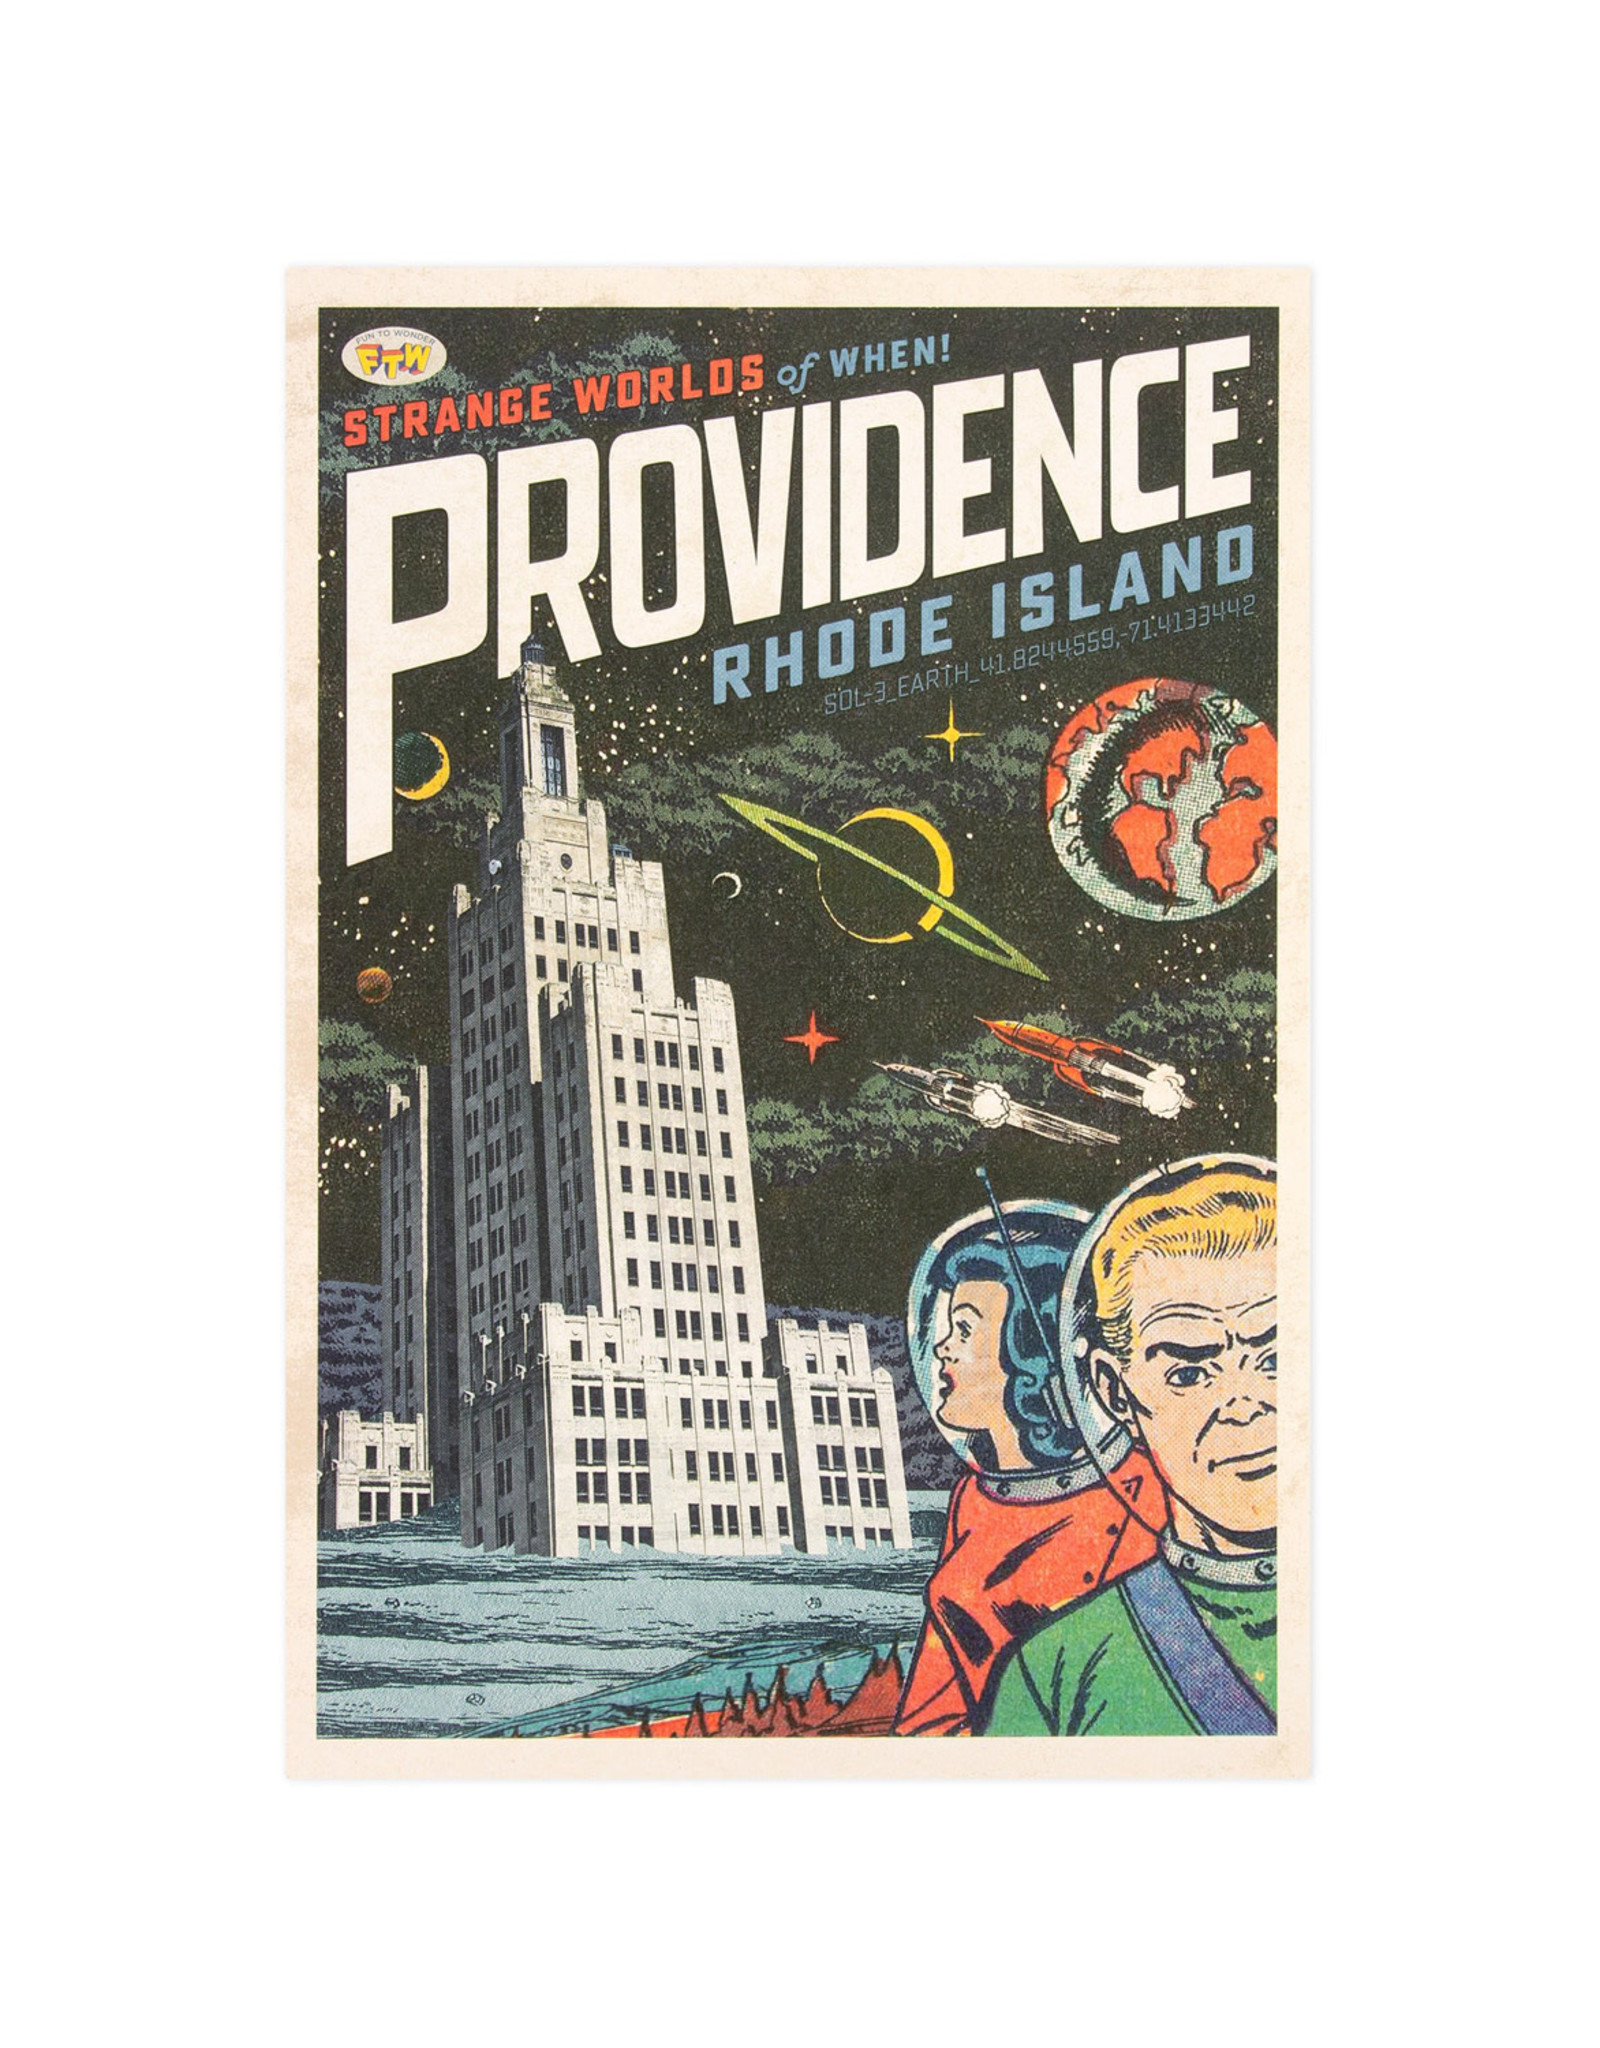 Strange Worlds of When! Print - Superman Building